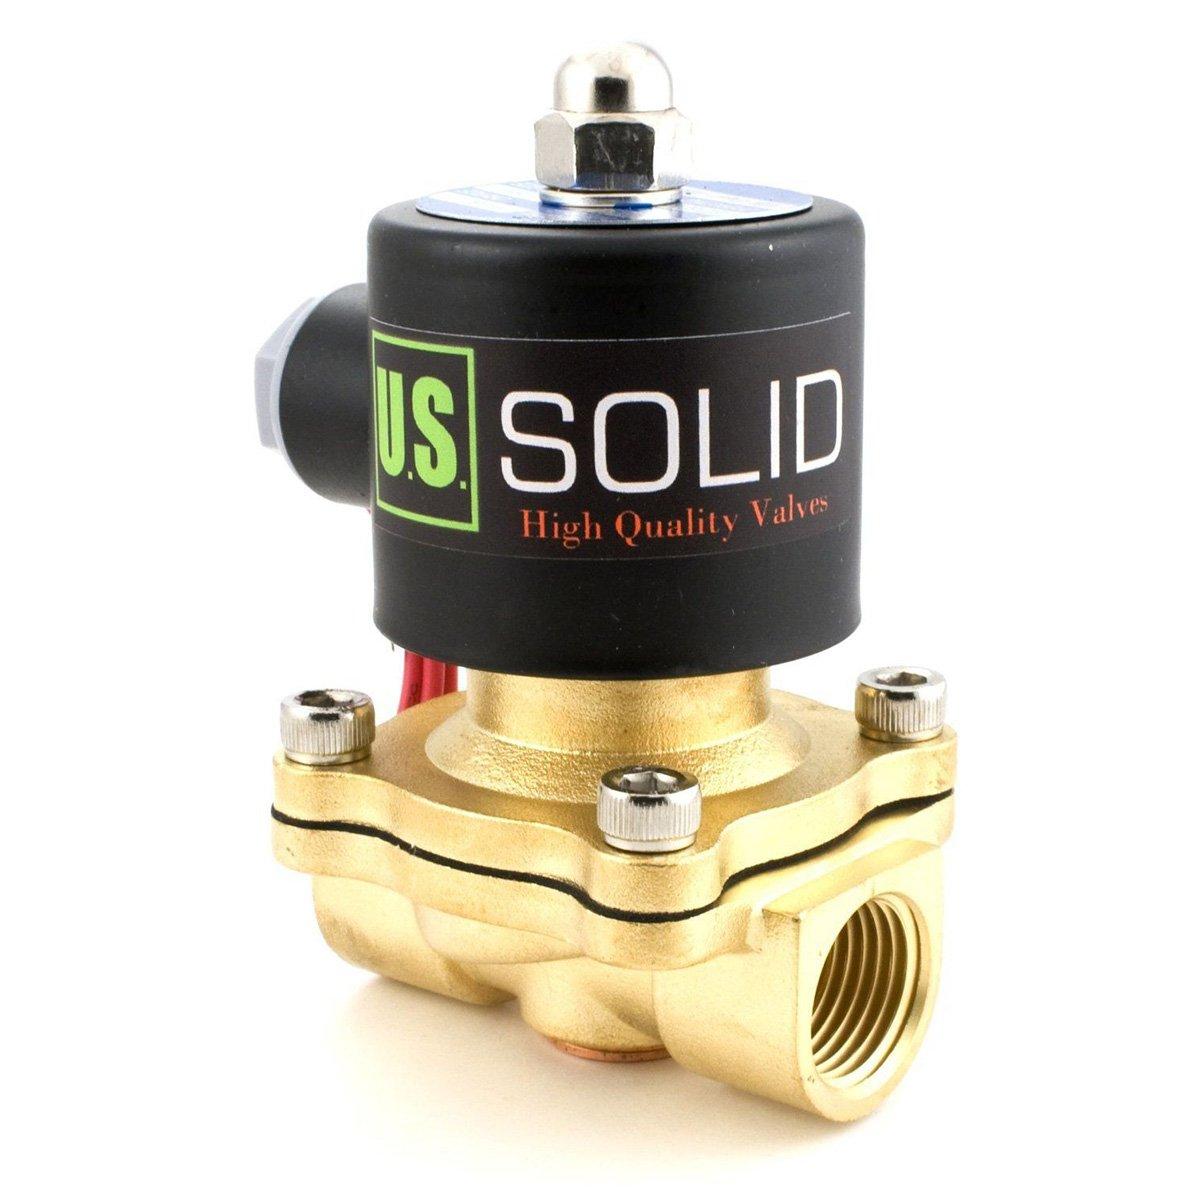 U.S. Solid 1/2' G 220V AC Messing Magnetventil Direktgesteuert fü r Wasser Luft Gas Ö l NC Brass Solenoid Valve